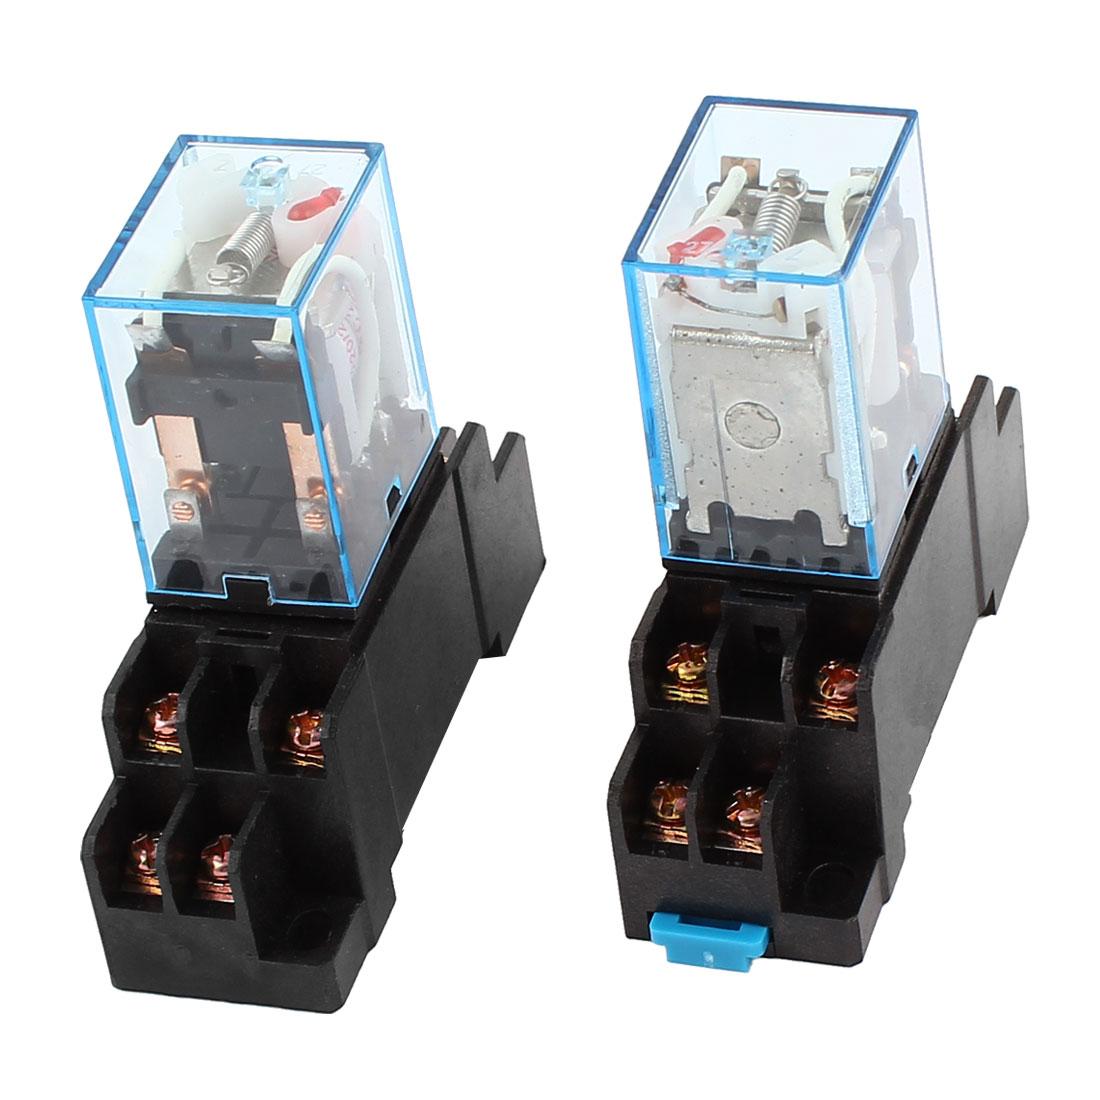 2 x AC 220V-240V Coil 8Pin DPDT 35mm DIN Rail Mount General Power Relay + Socket